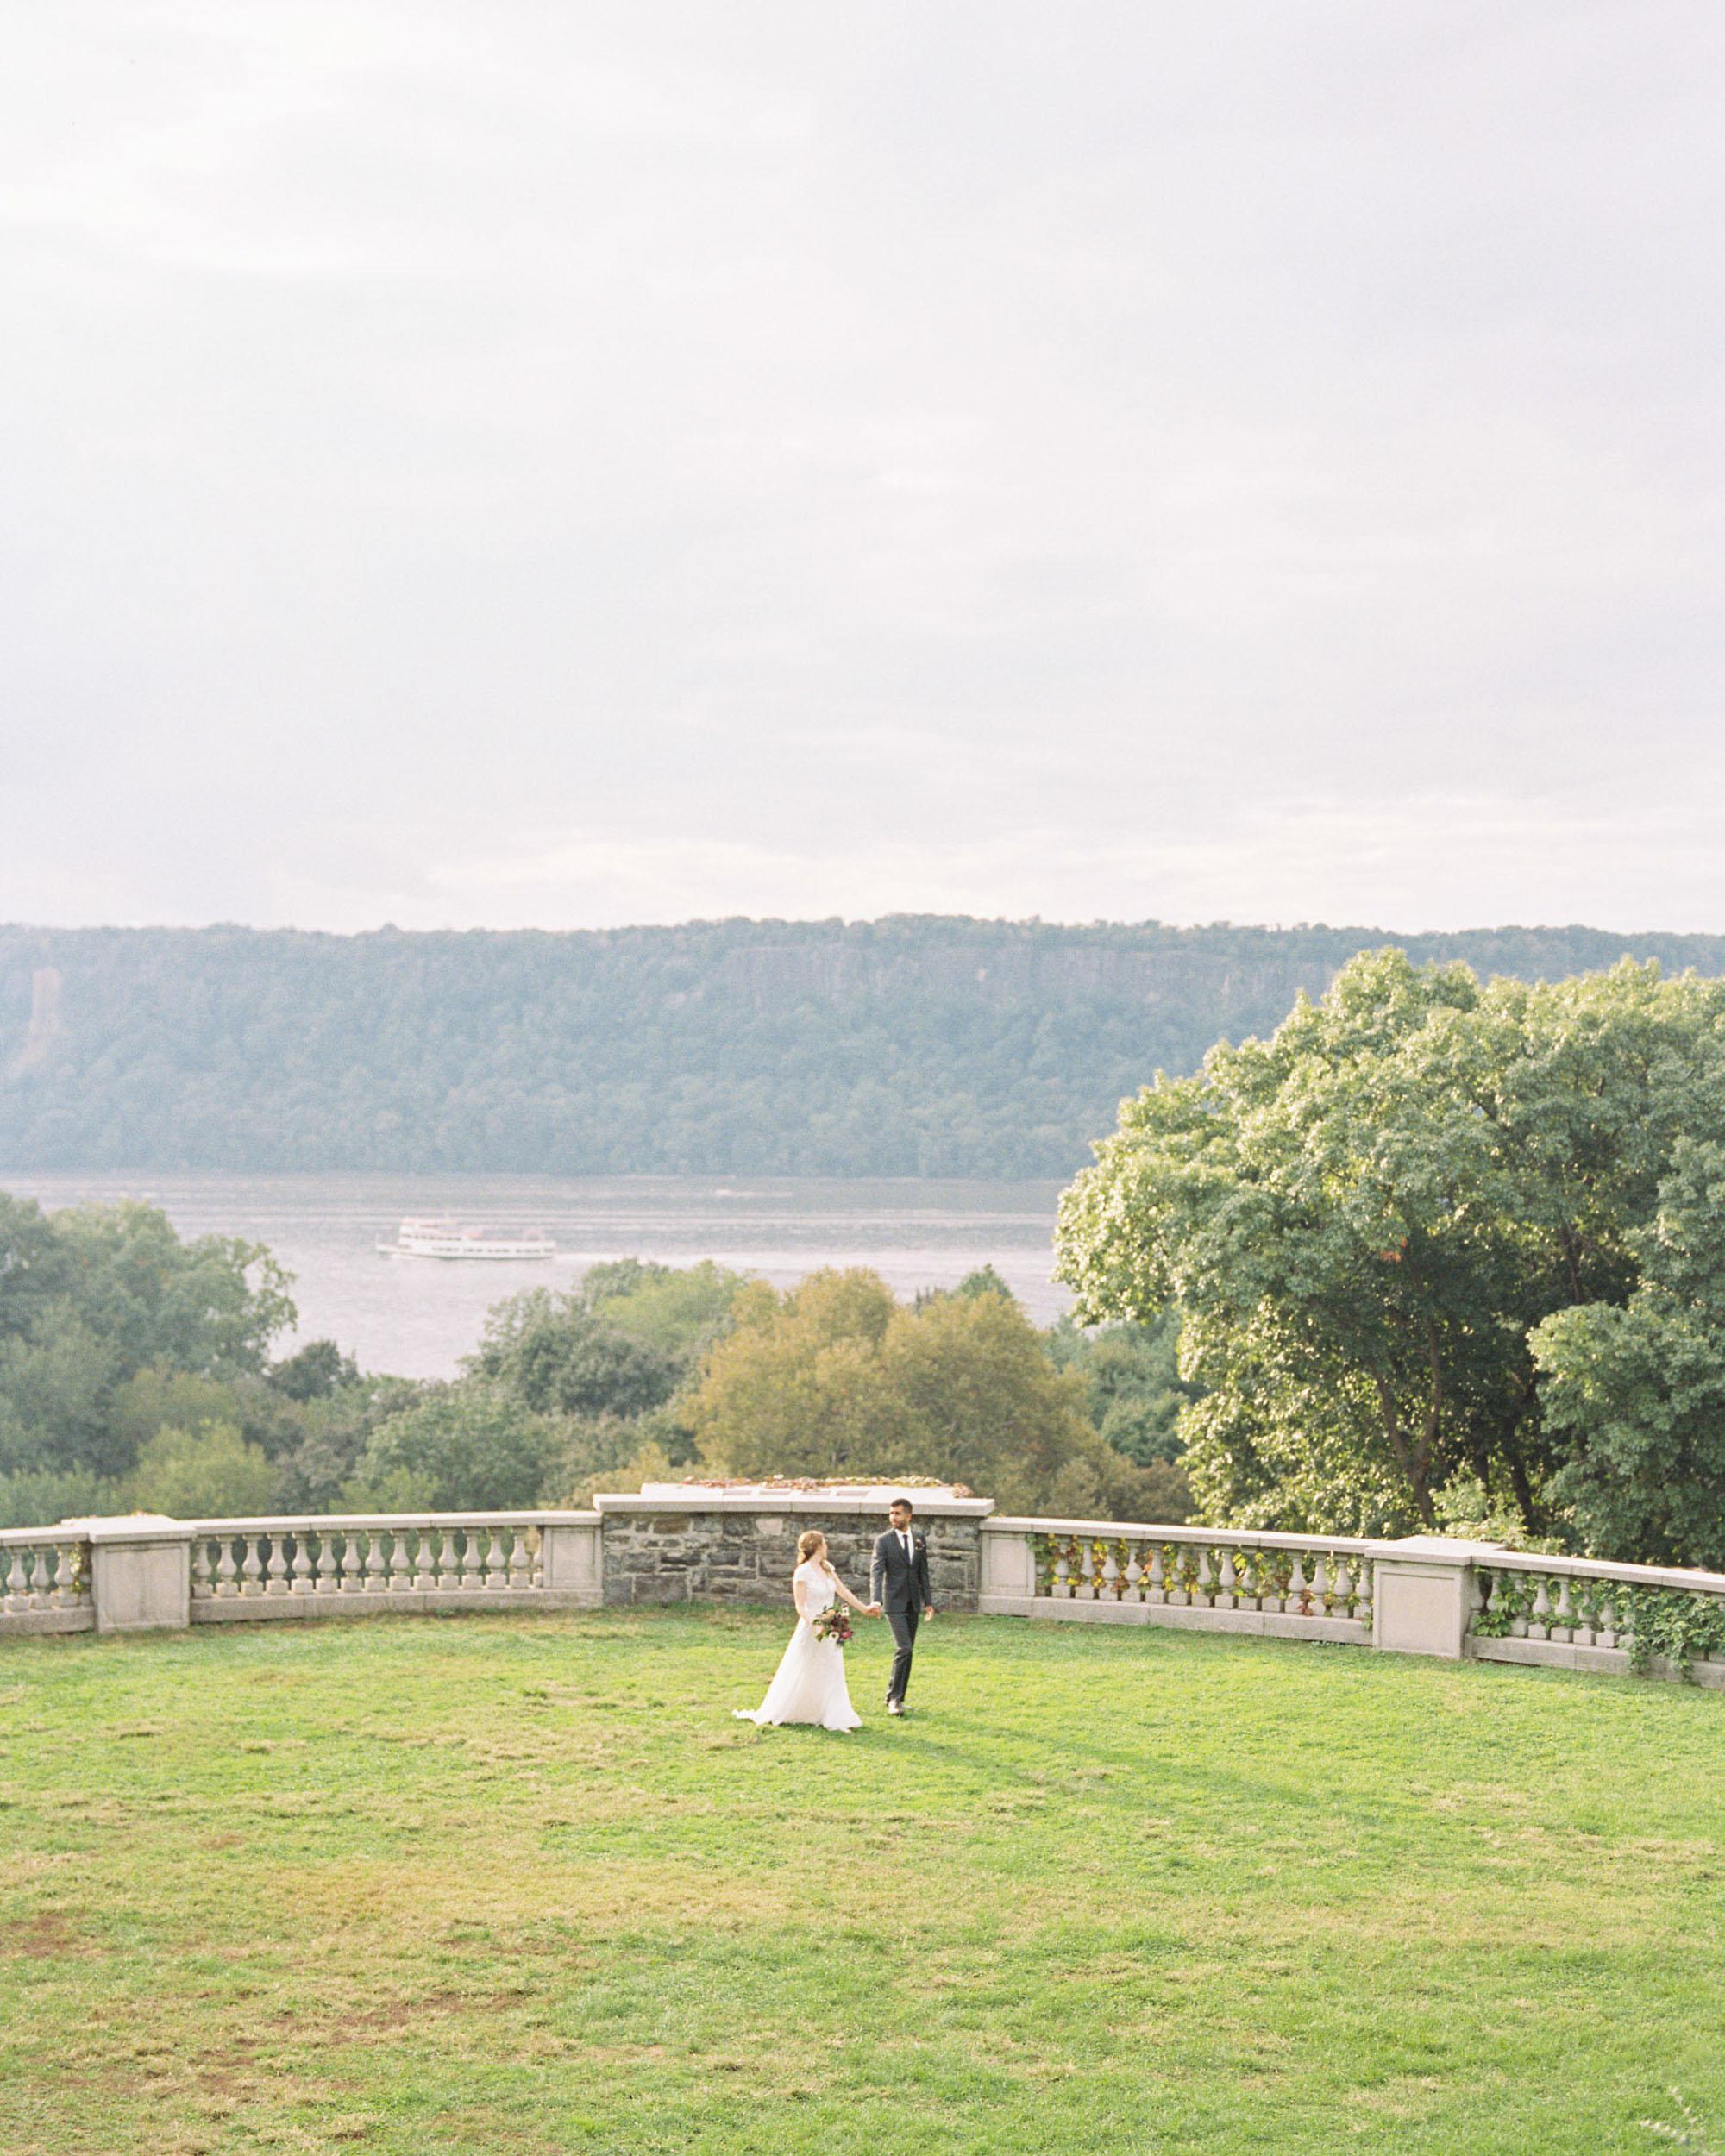 Wave Hill Wedding Photographer 0025 - Wave Hill